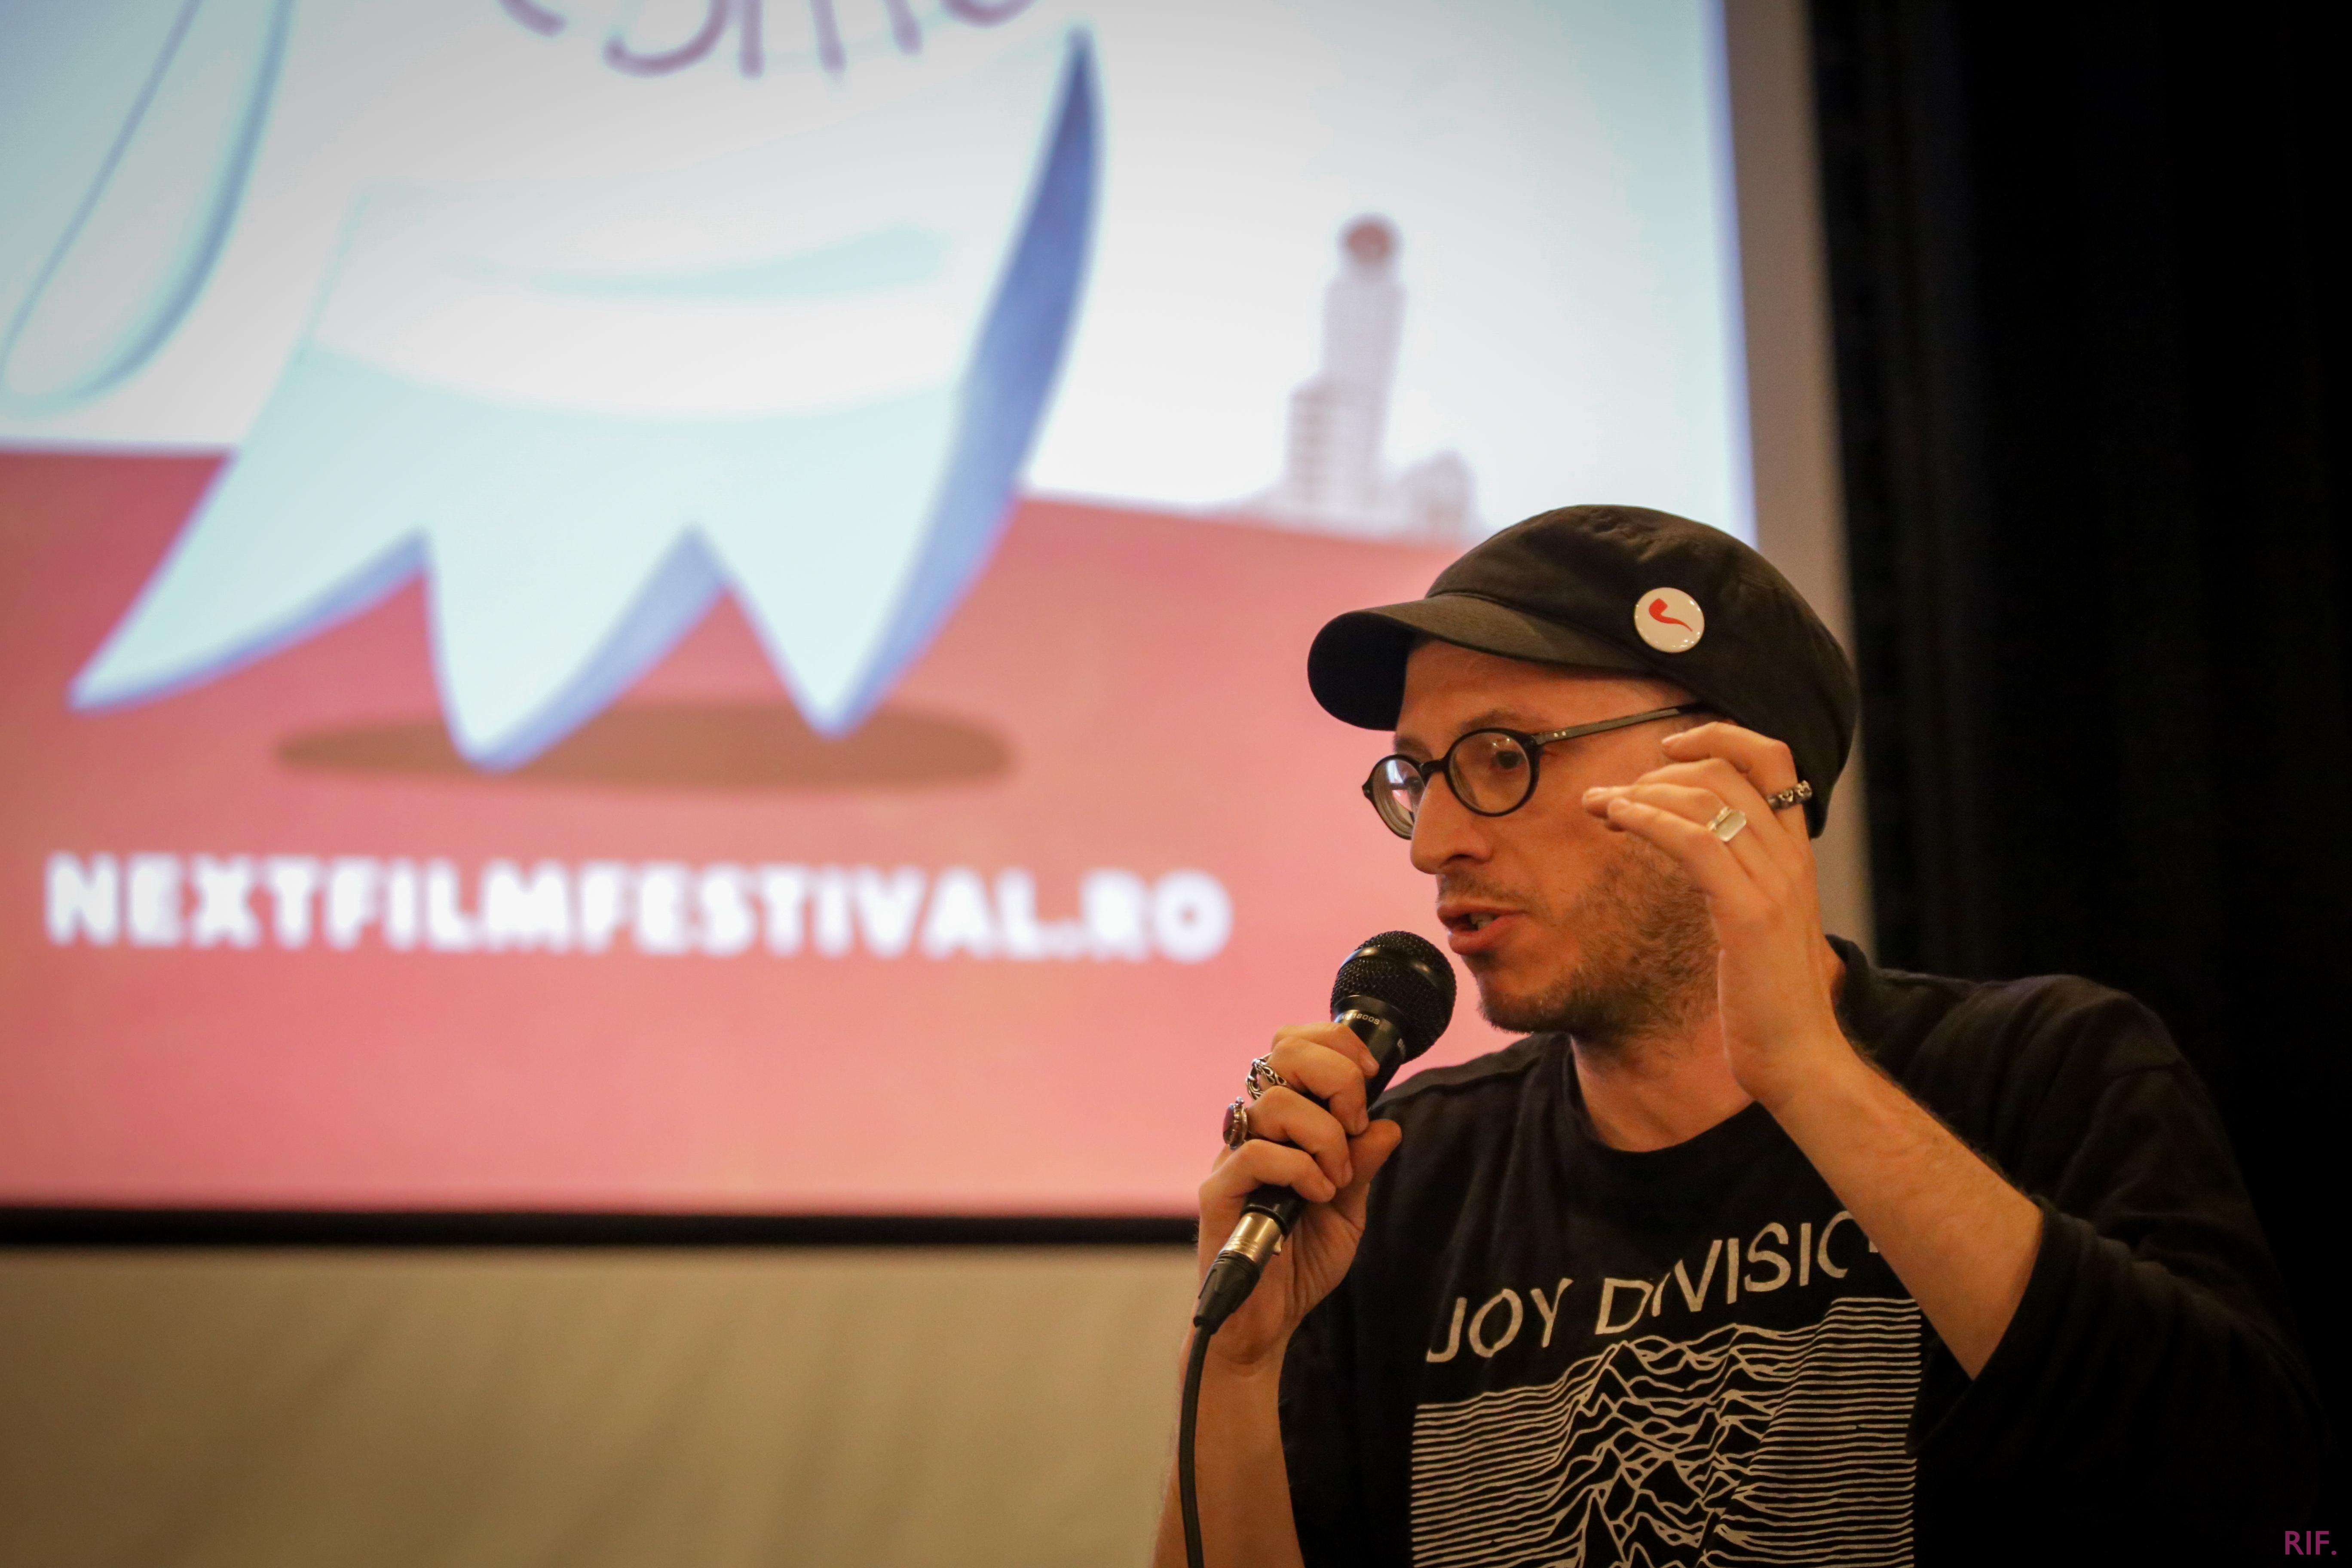 NexT Film Festival: 7-11 Aprilie 2016